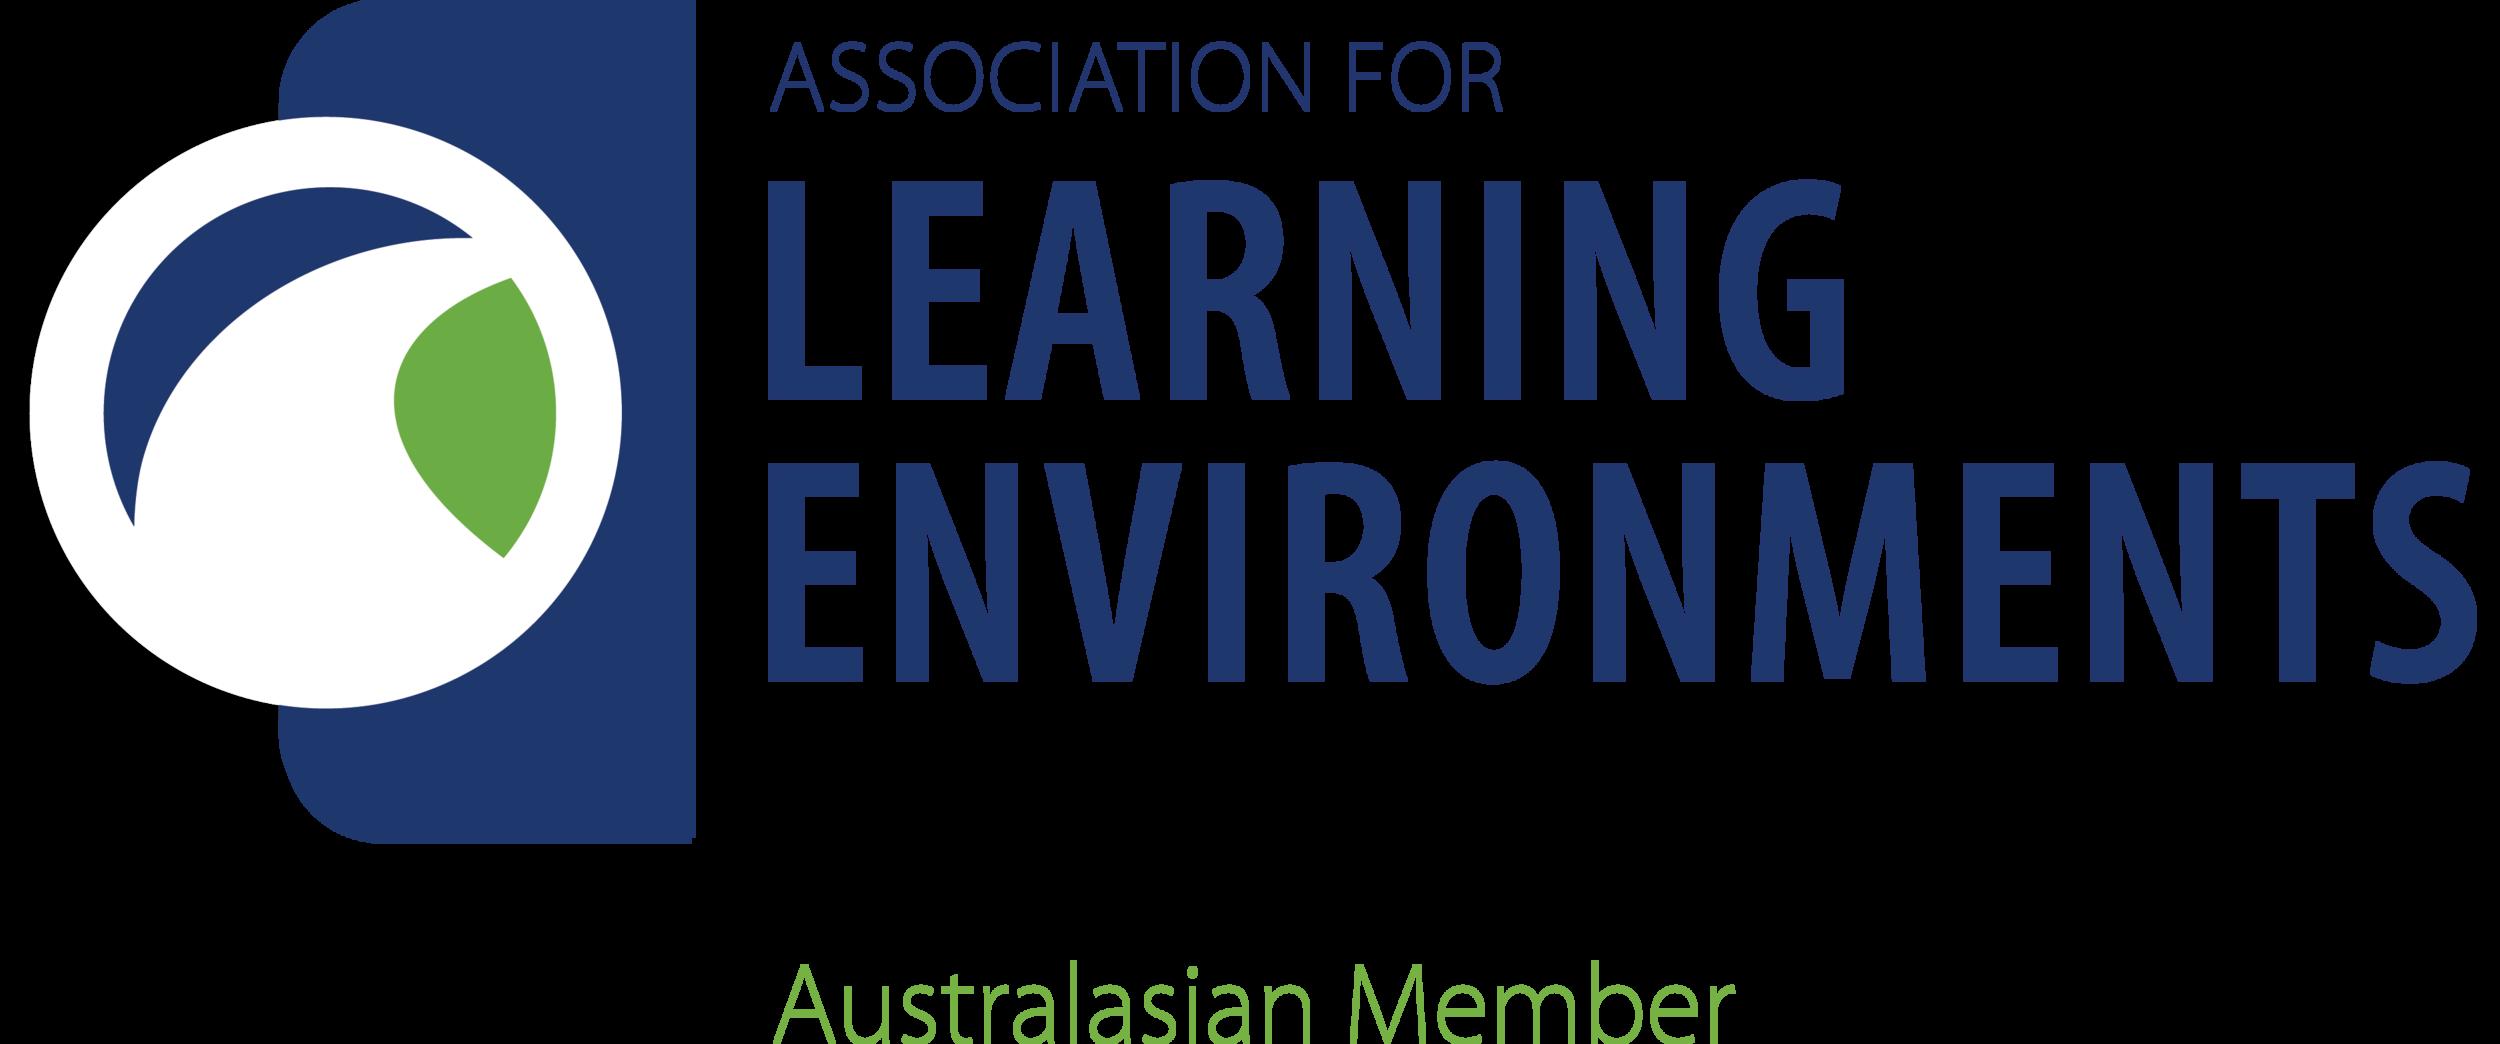 LEARNING-ENVIRONMENT-LOGO_AUSTRALASIAN__MEMBER.png